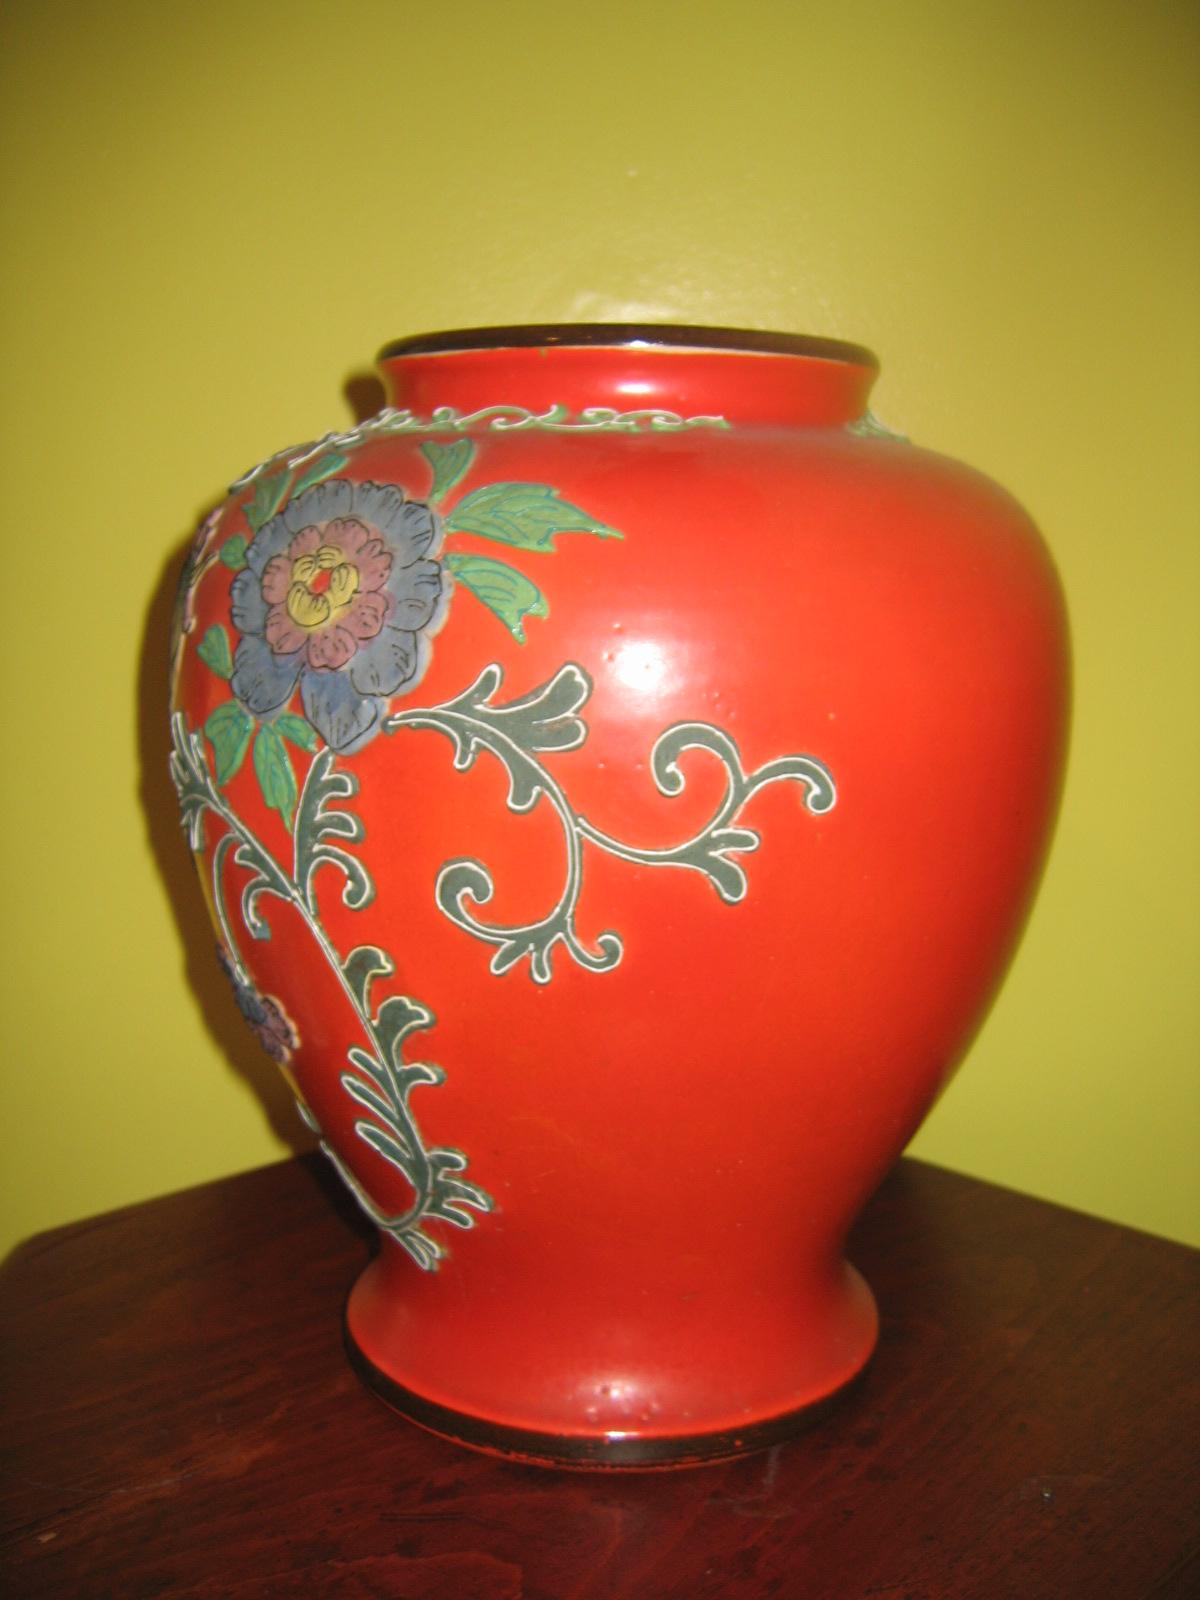 Vintage japanese ceramic pottery majolica floral flower vase vintage japanese ceramic pottery majolica floral flower vase item 275 for sale antiques classifieds reviewsmspy